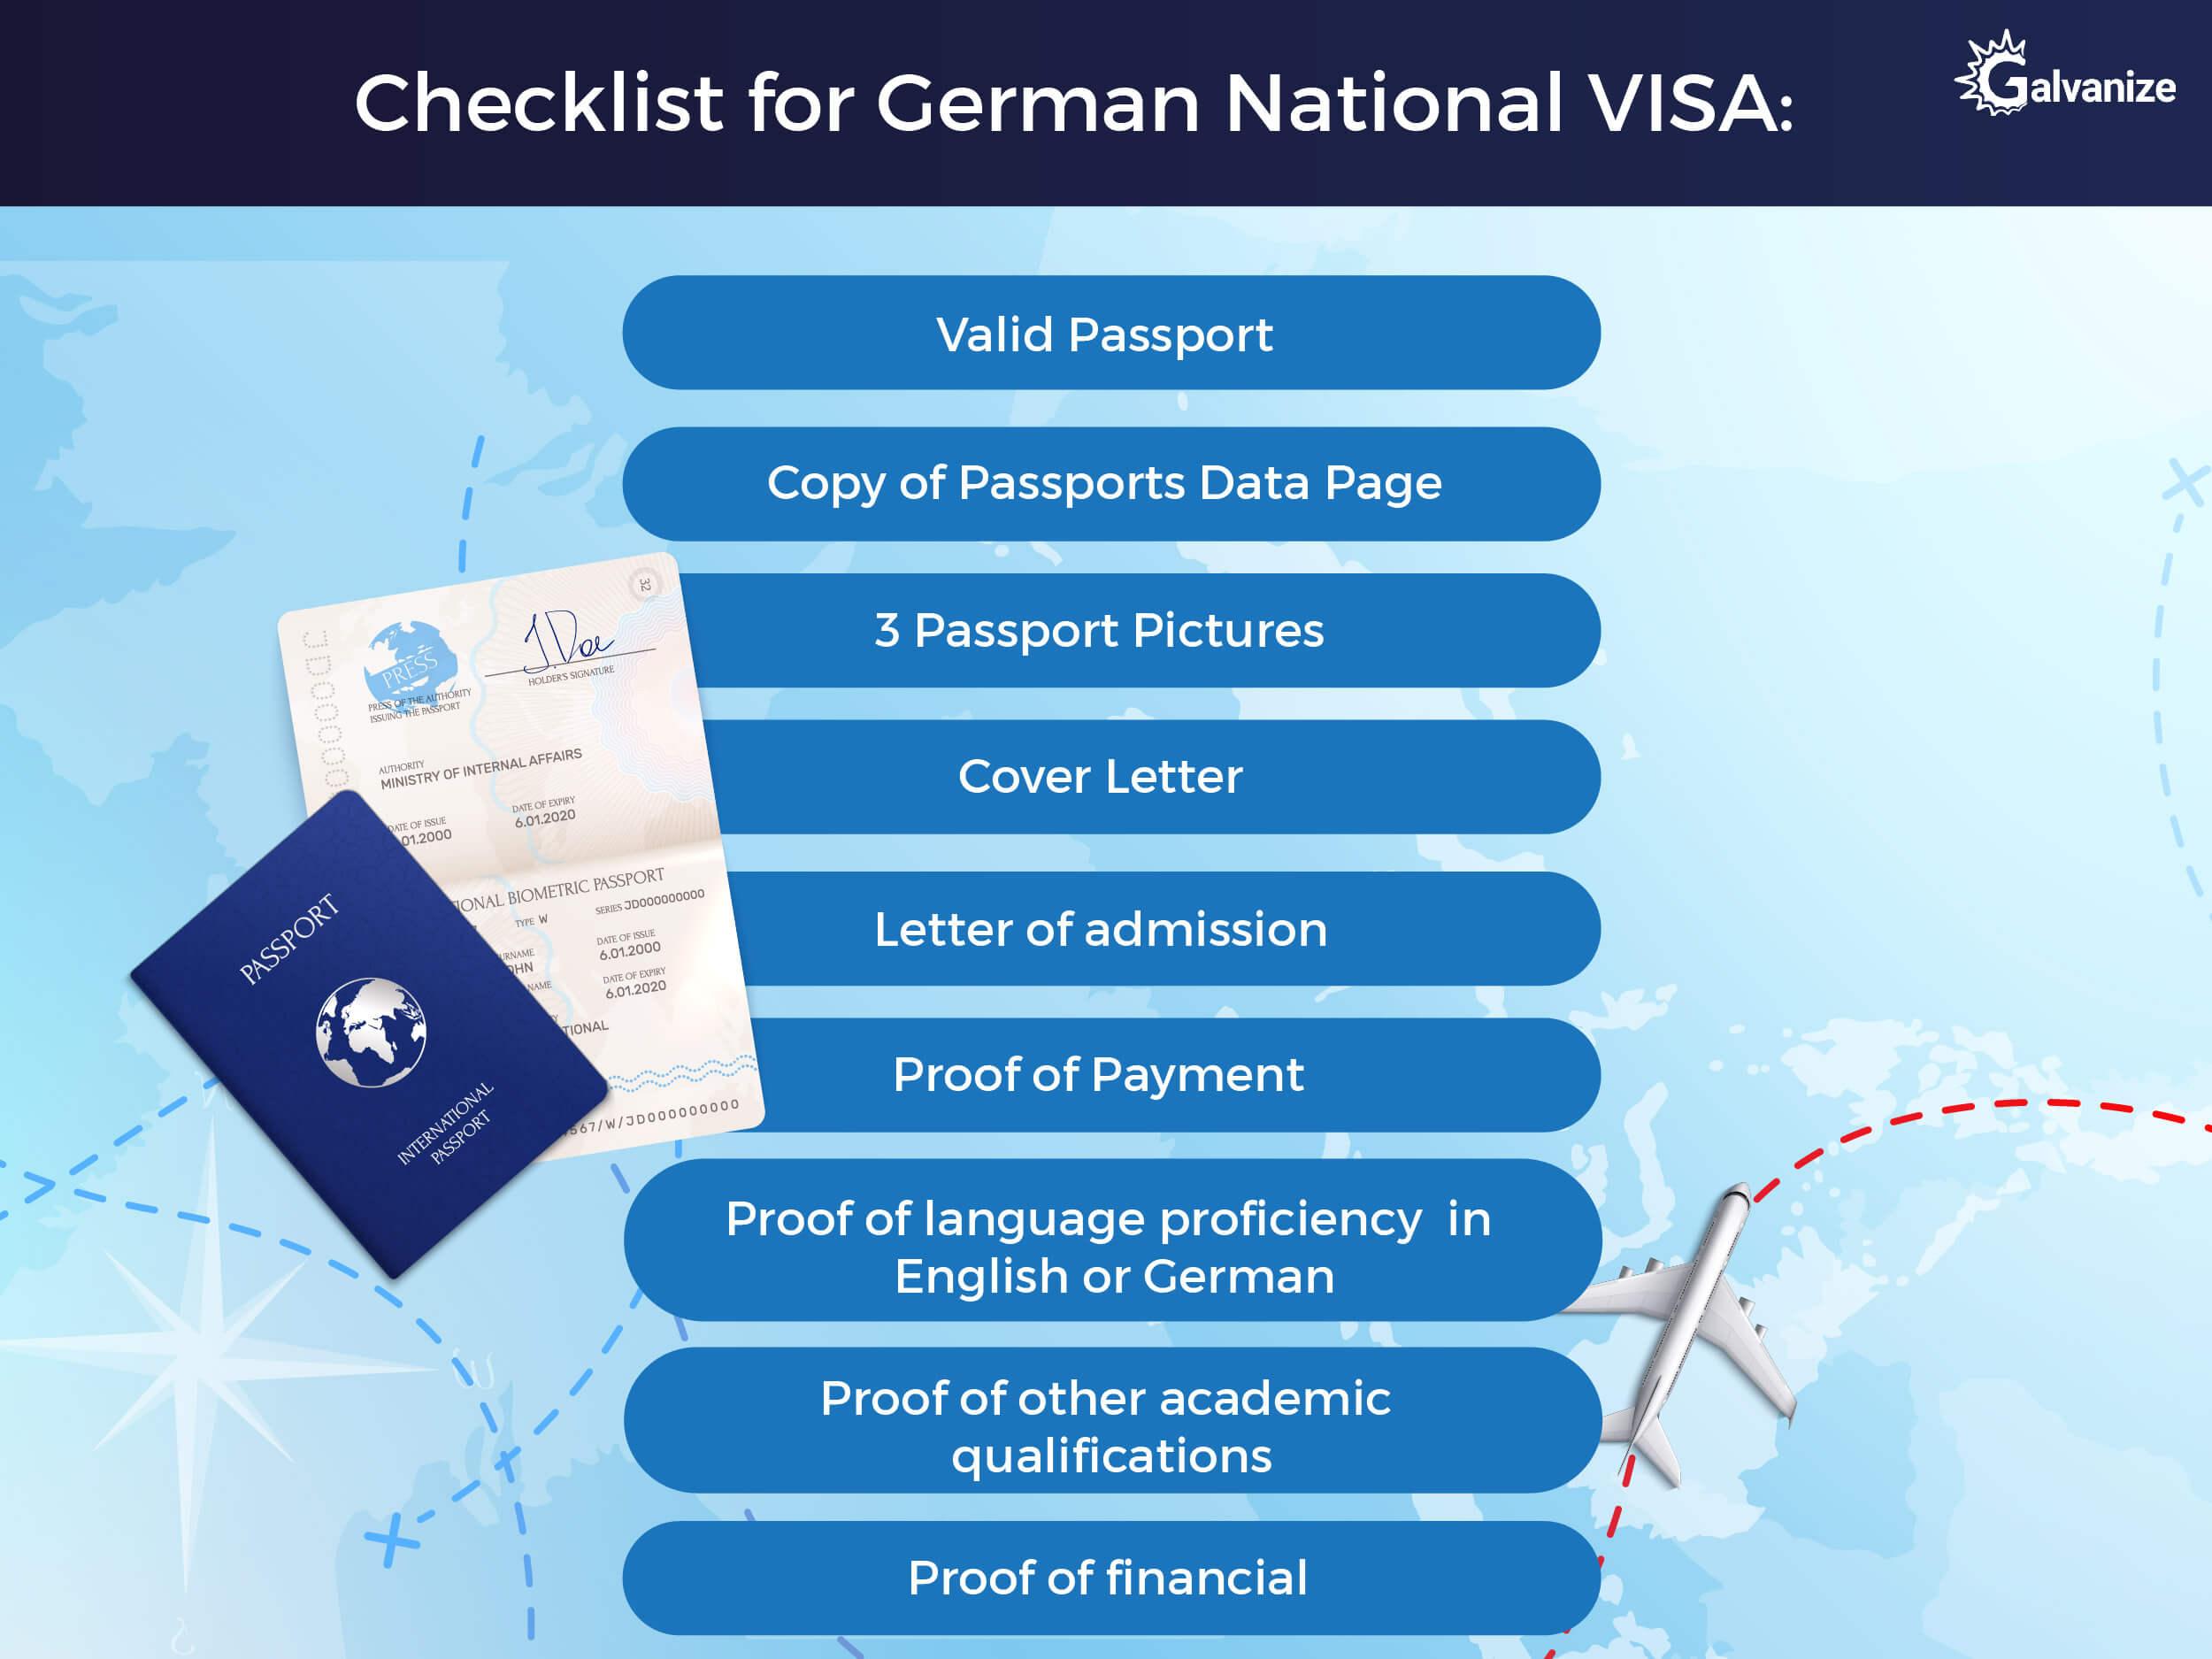 CHECK LIST for German National VISA